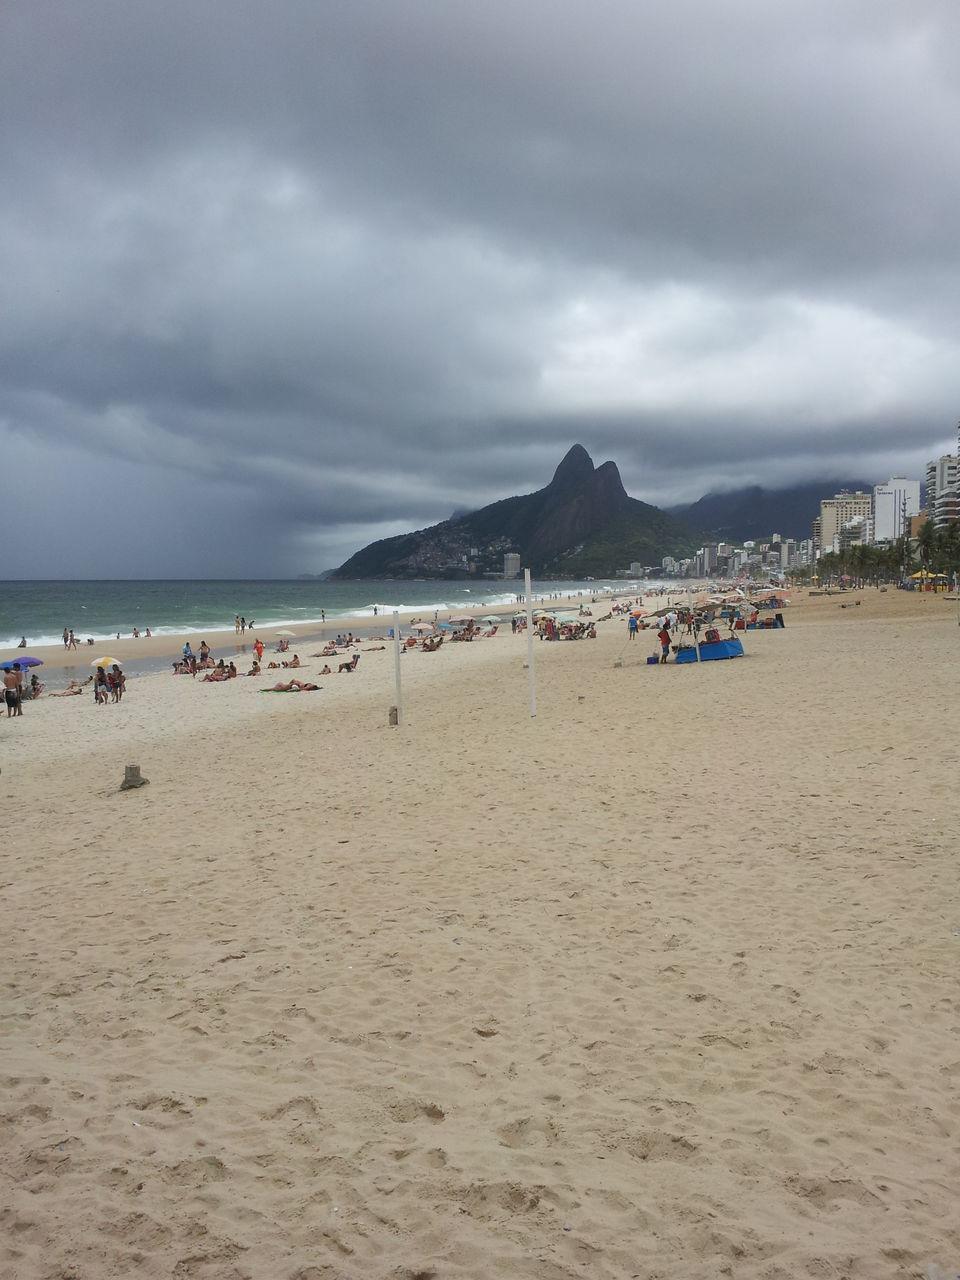 Landscape of sandy beach